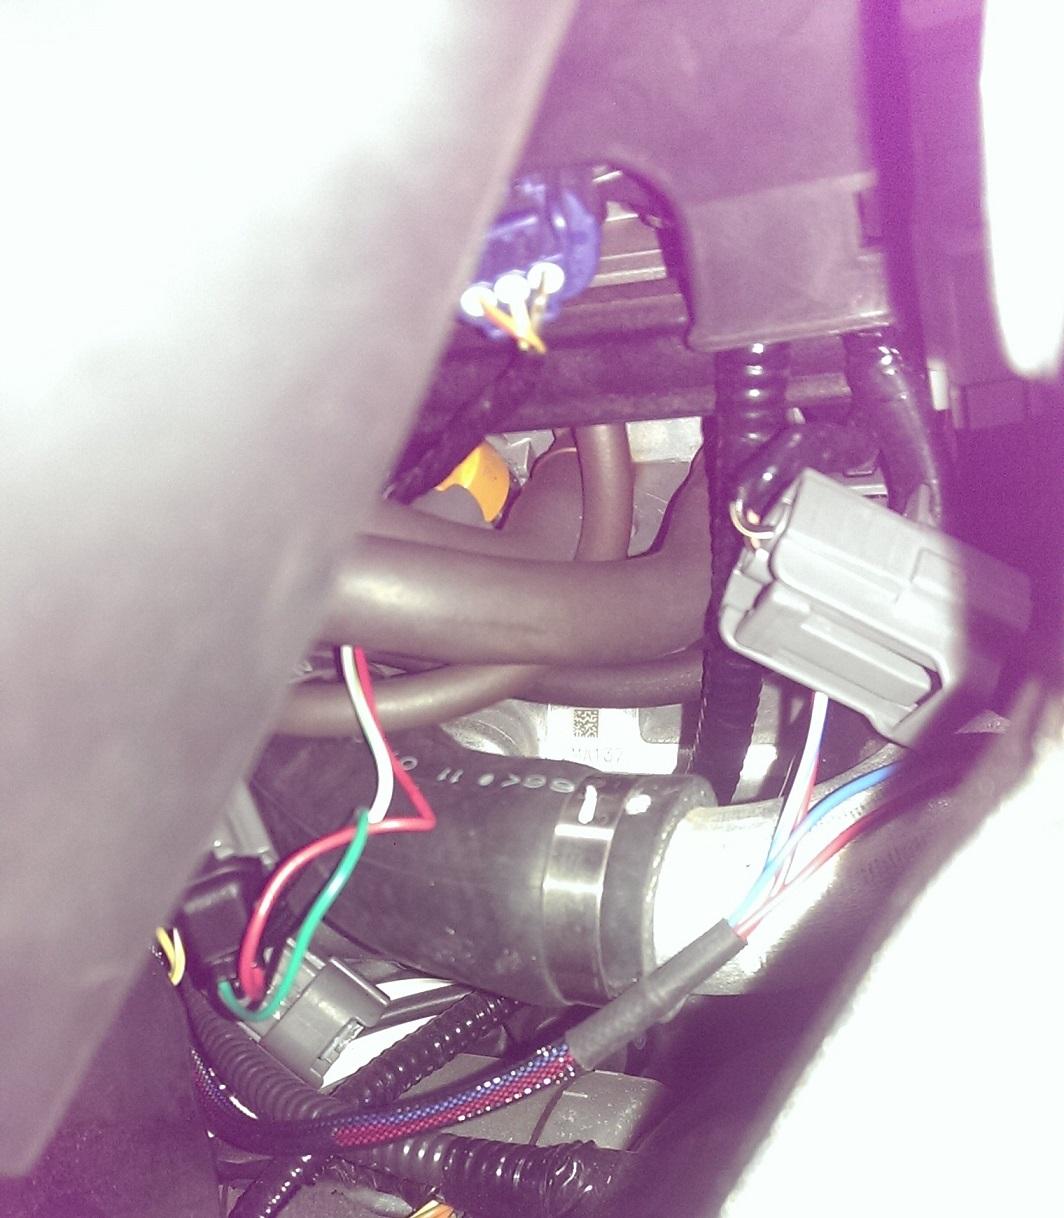 CBR600RR(国内)  逆車ECUにパワーコマンダーV_e0114857_21341877.jpg